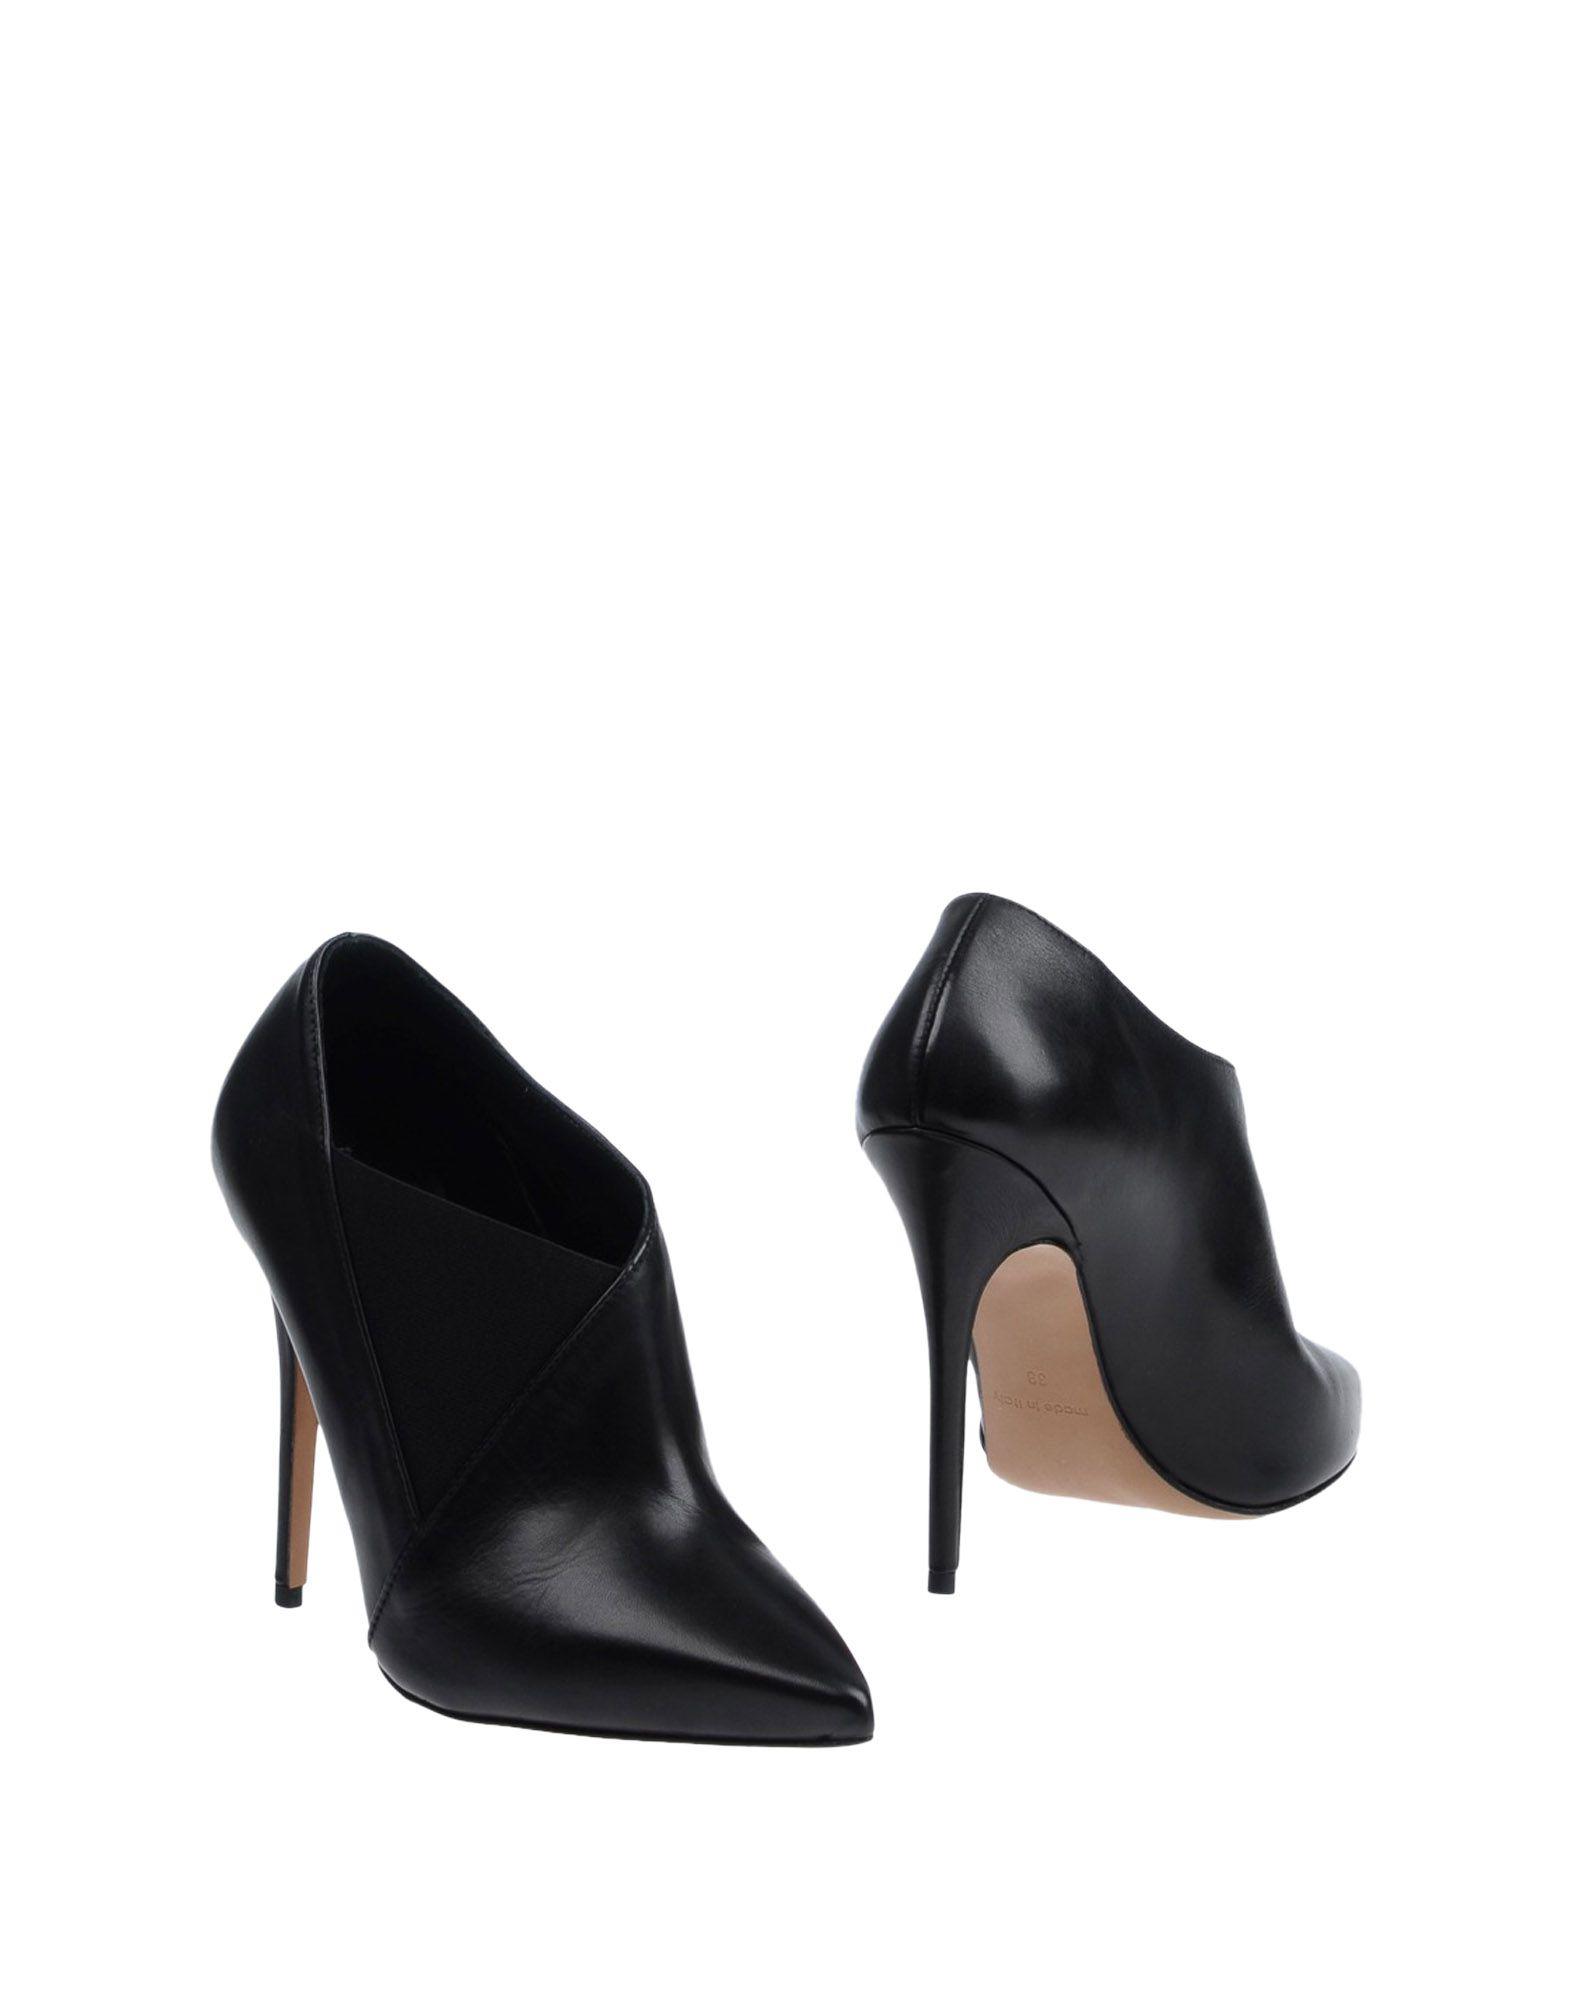 LES TROIS GARÇONS Ботинки l3v брюки для девочки a5418p синий les trois valees